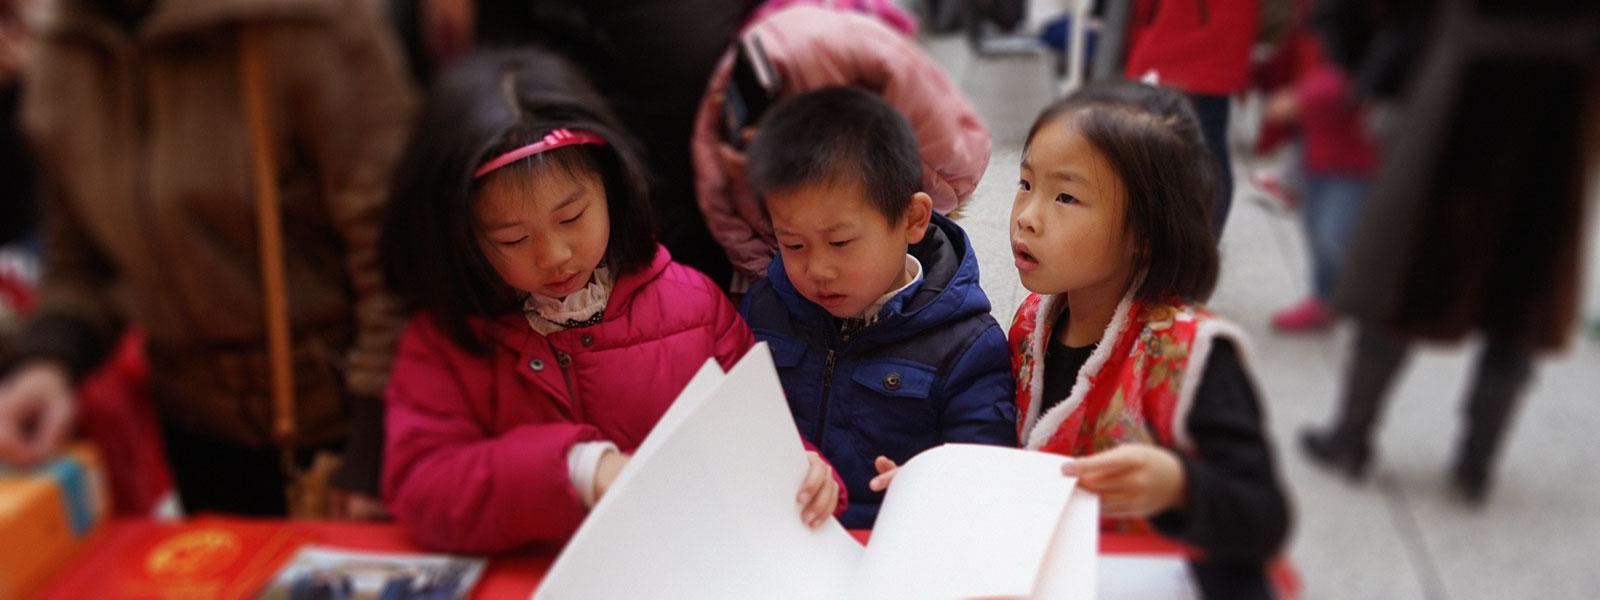 Children organizing